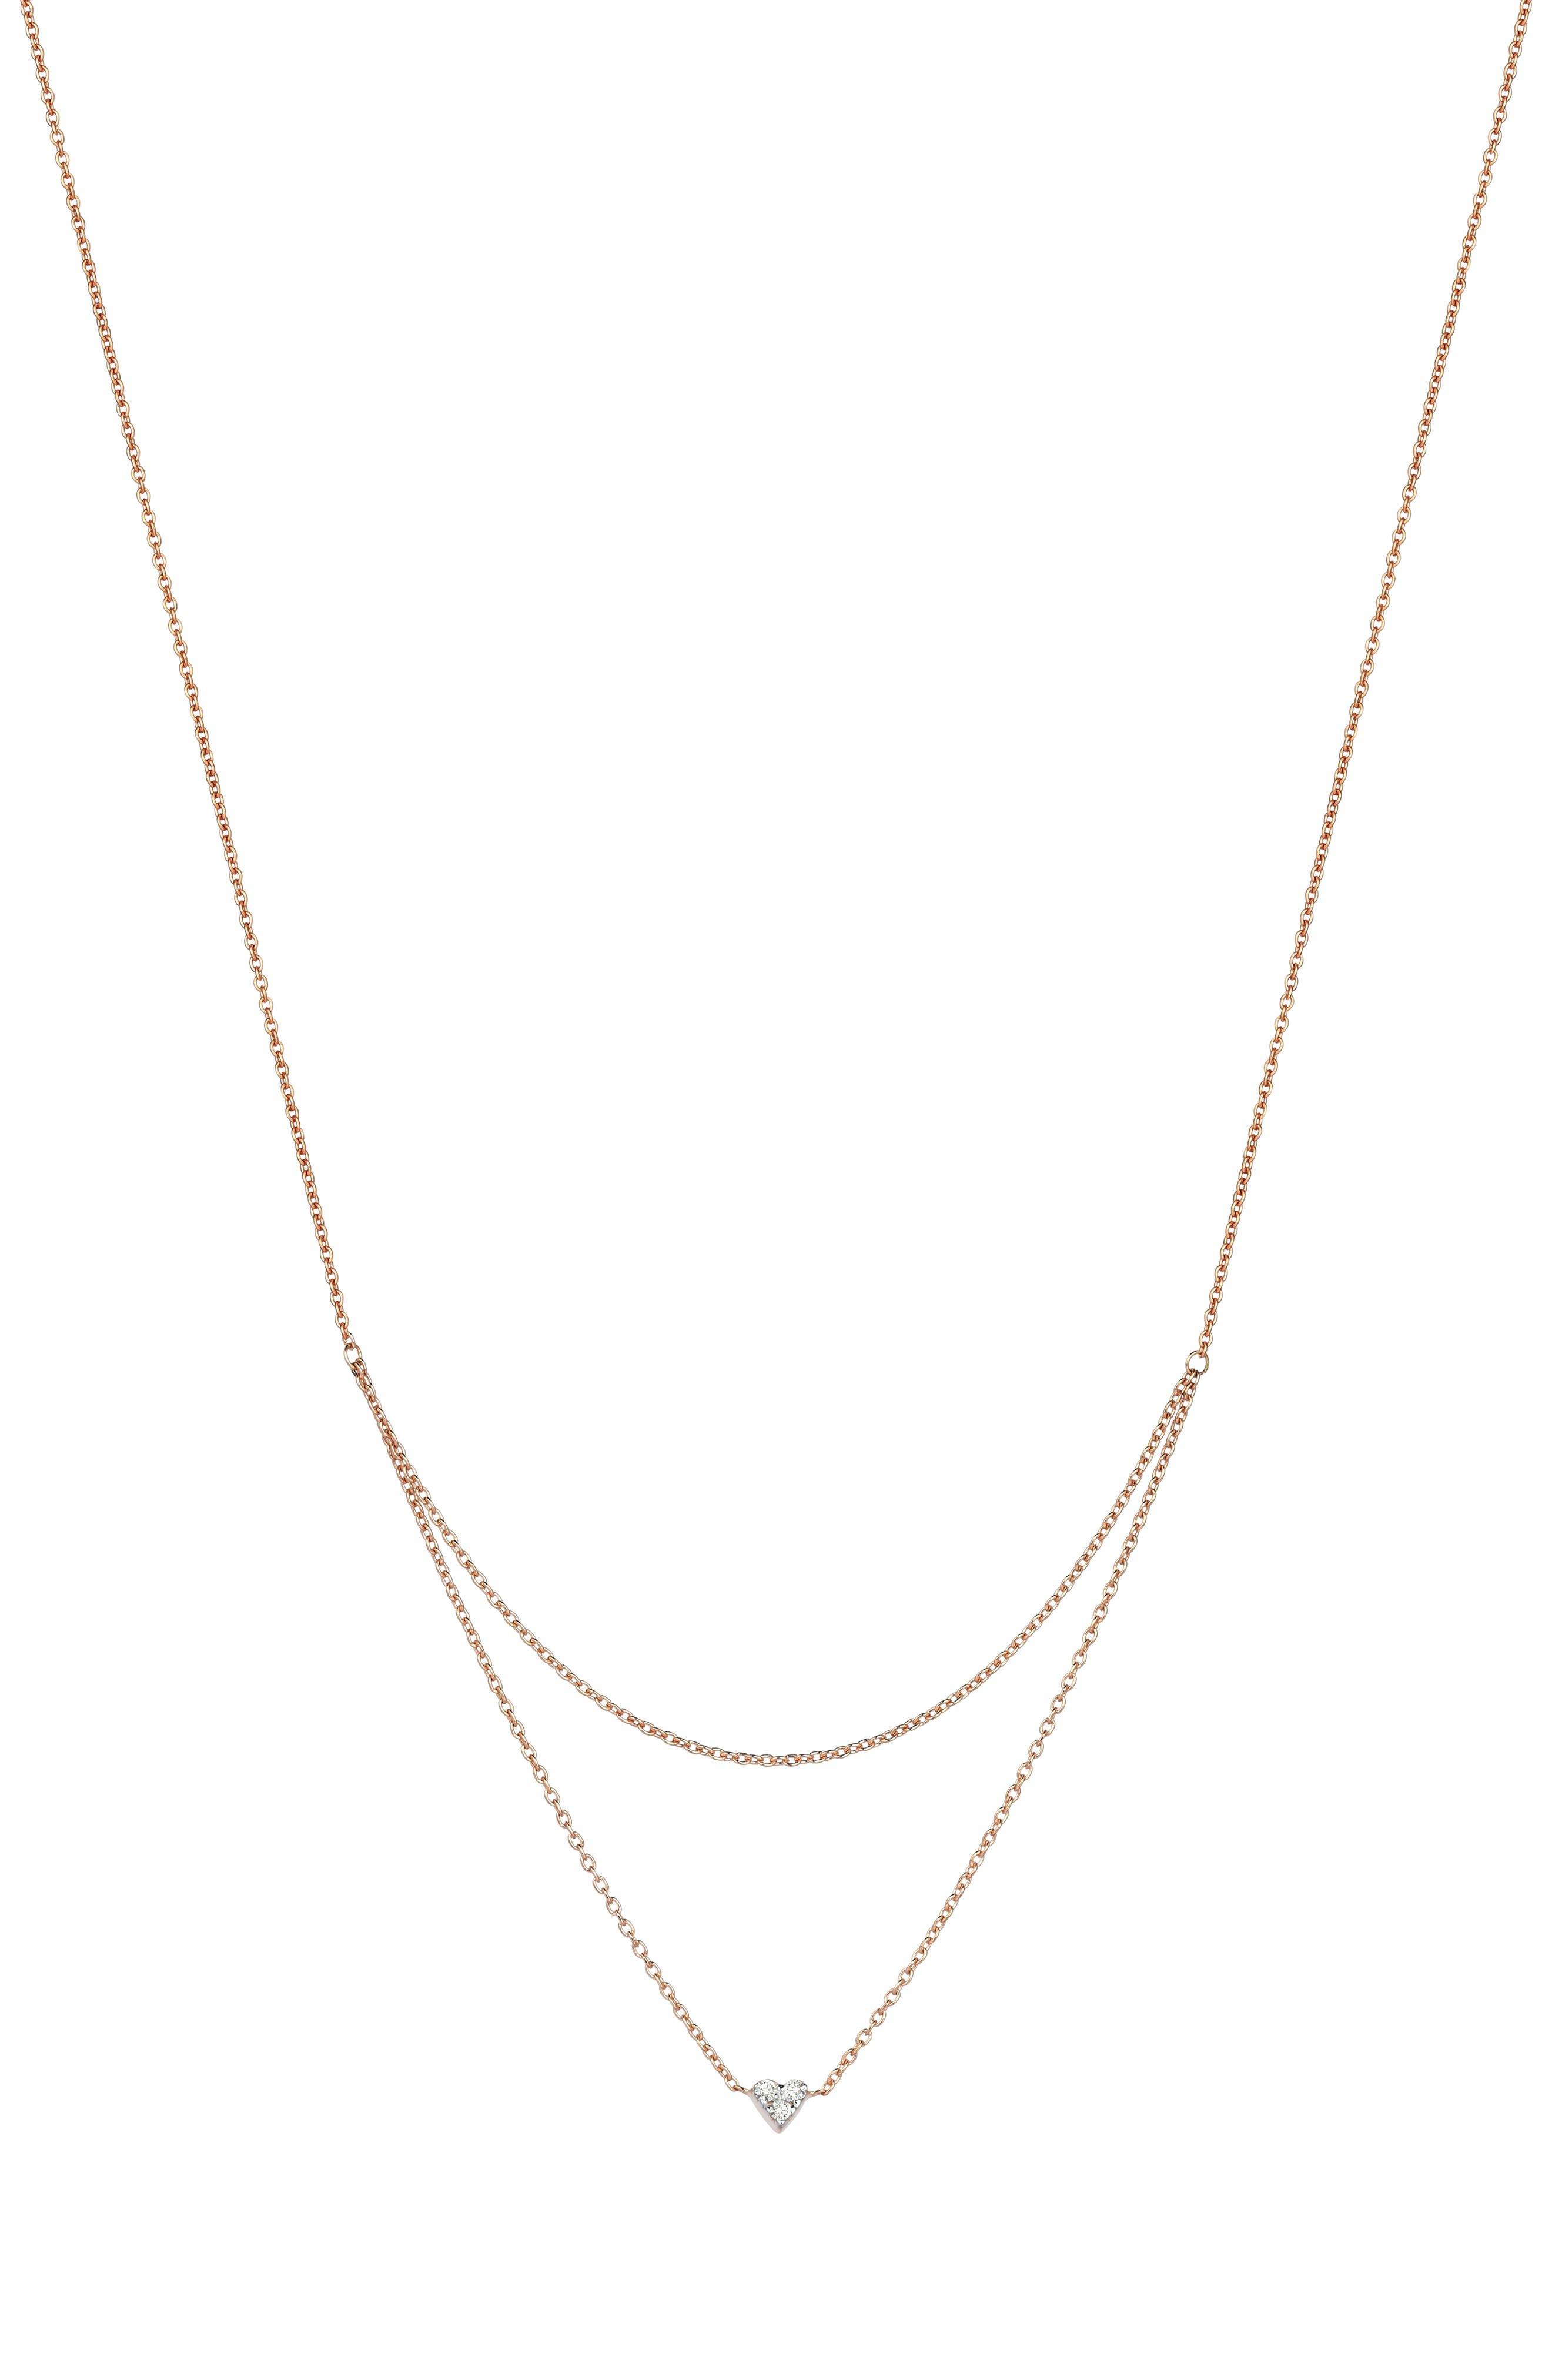 Double Layer Diamond Pendant Necklace,                             Main thumbnail 1, color,                             ROSE GOLD